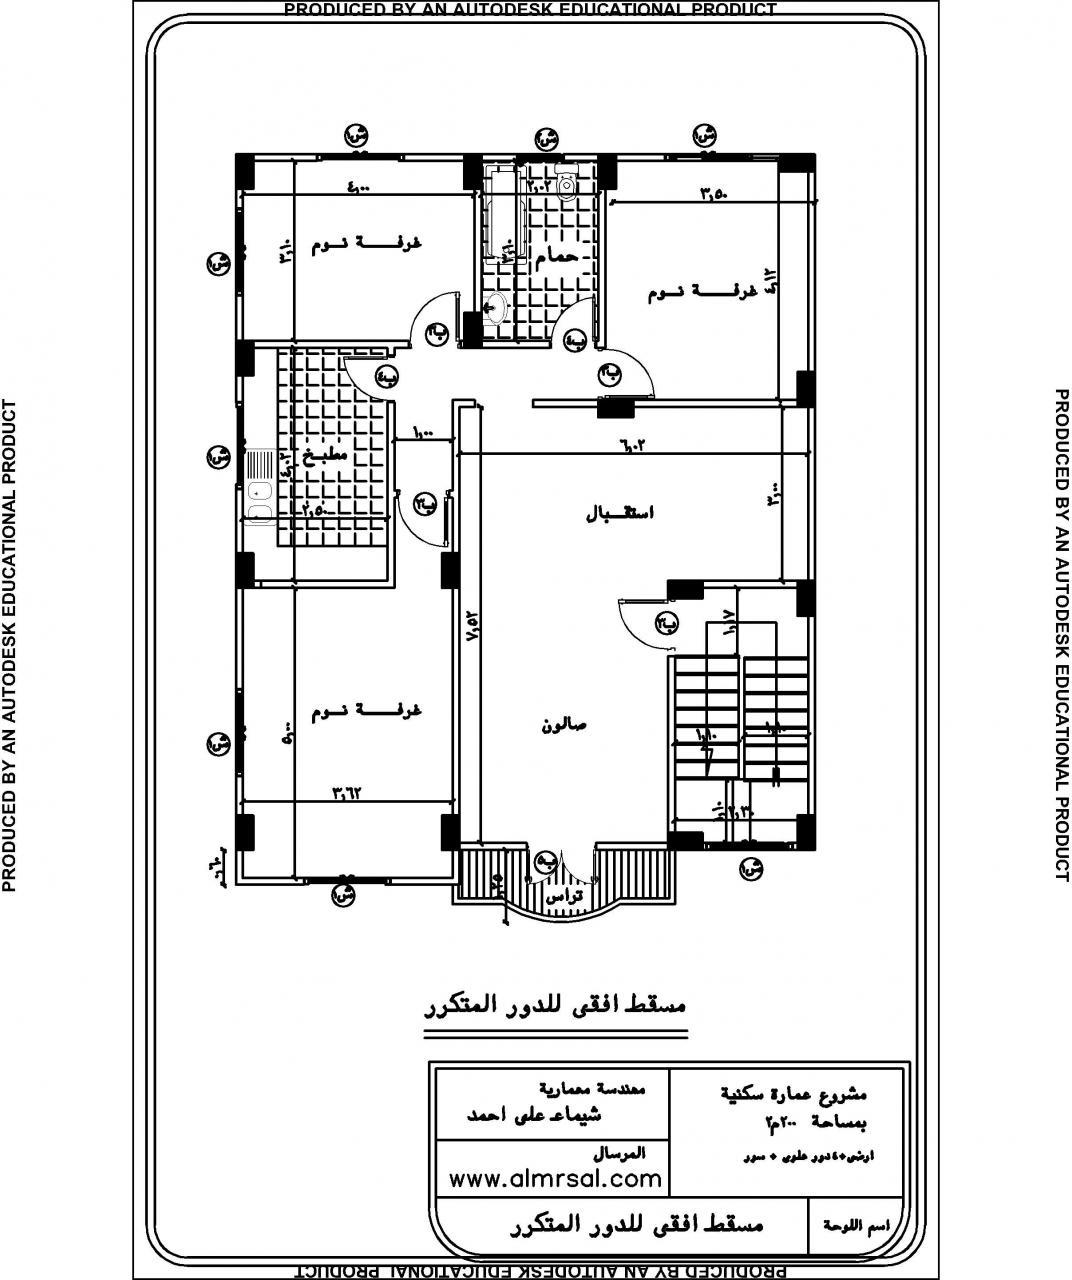 تصميم شقة 200 متر from cofee.cc